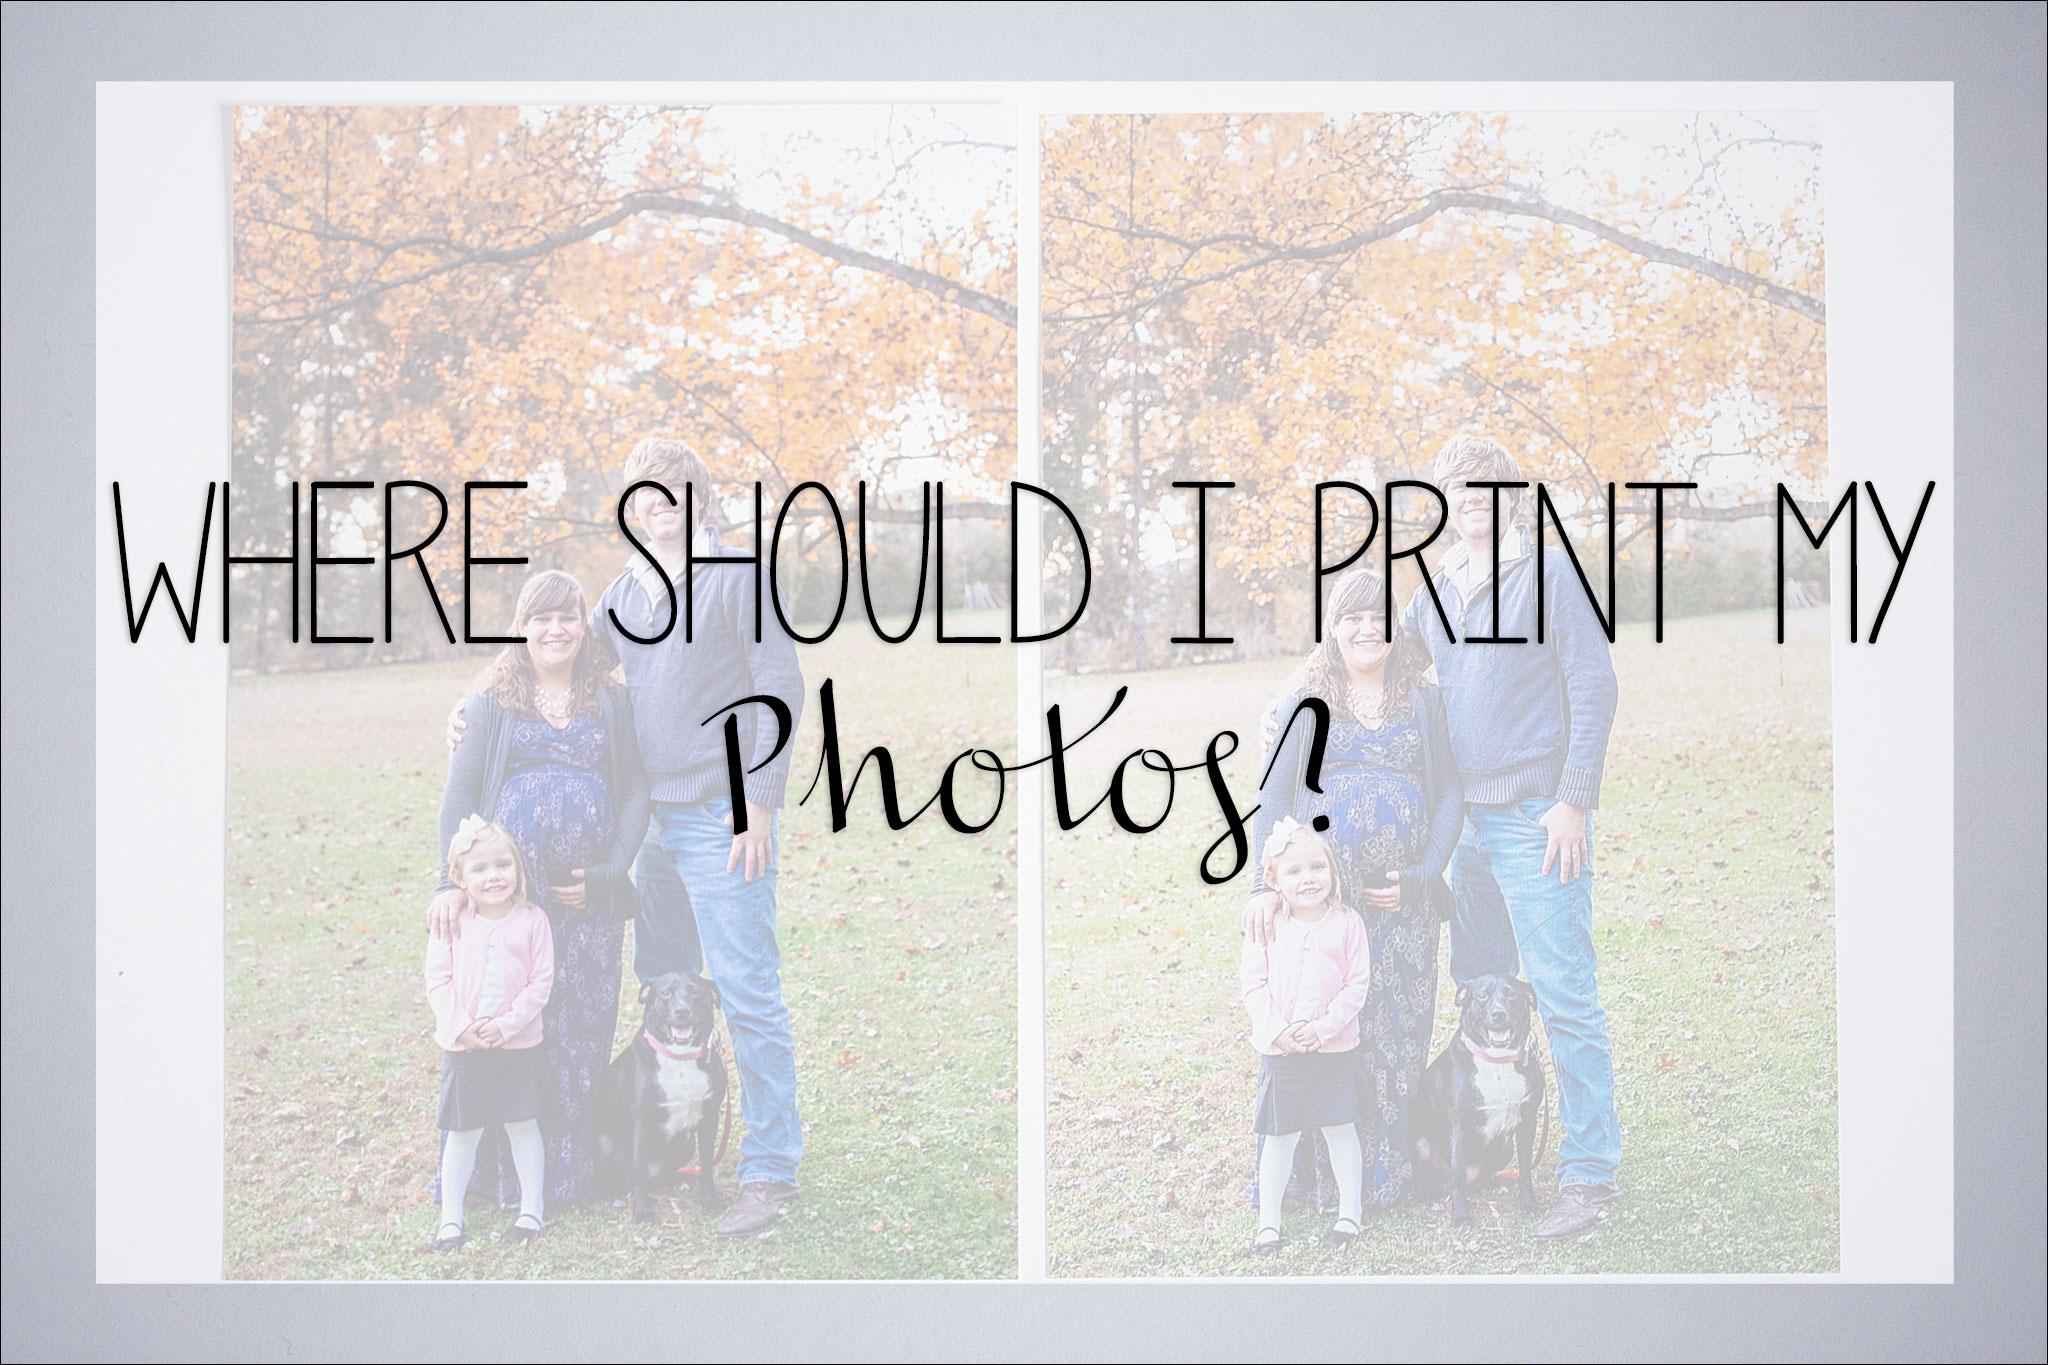 Where Should I Print My Photos Consumer Professional Lab Comparison